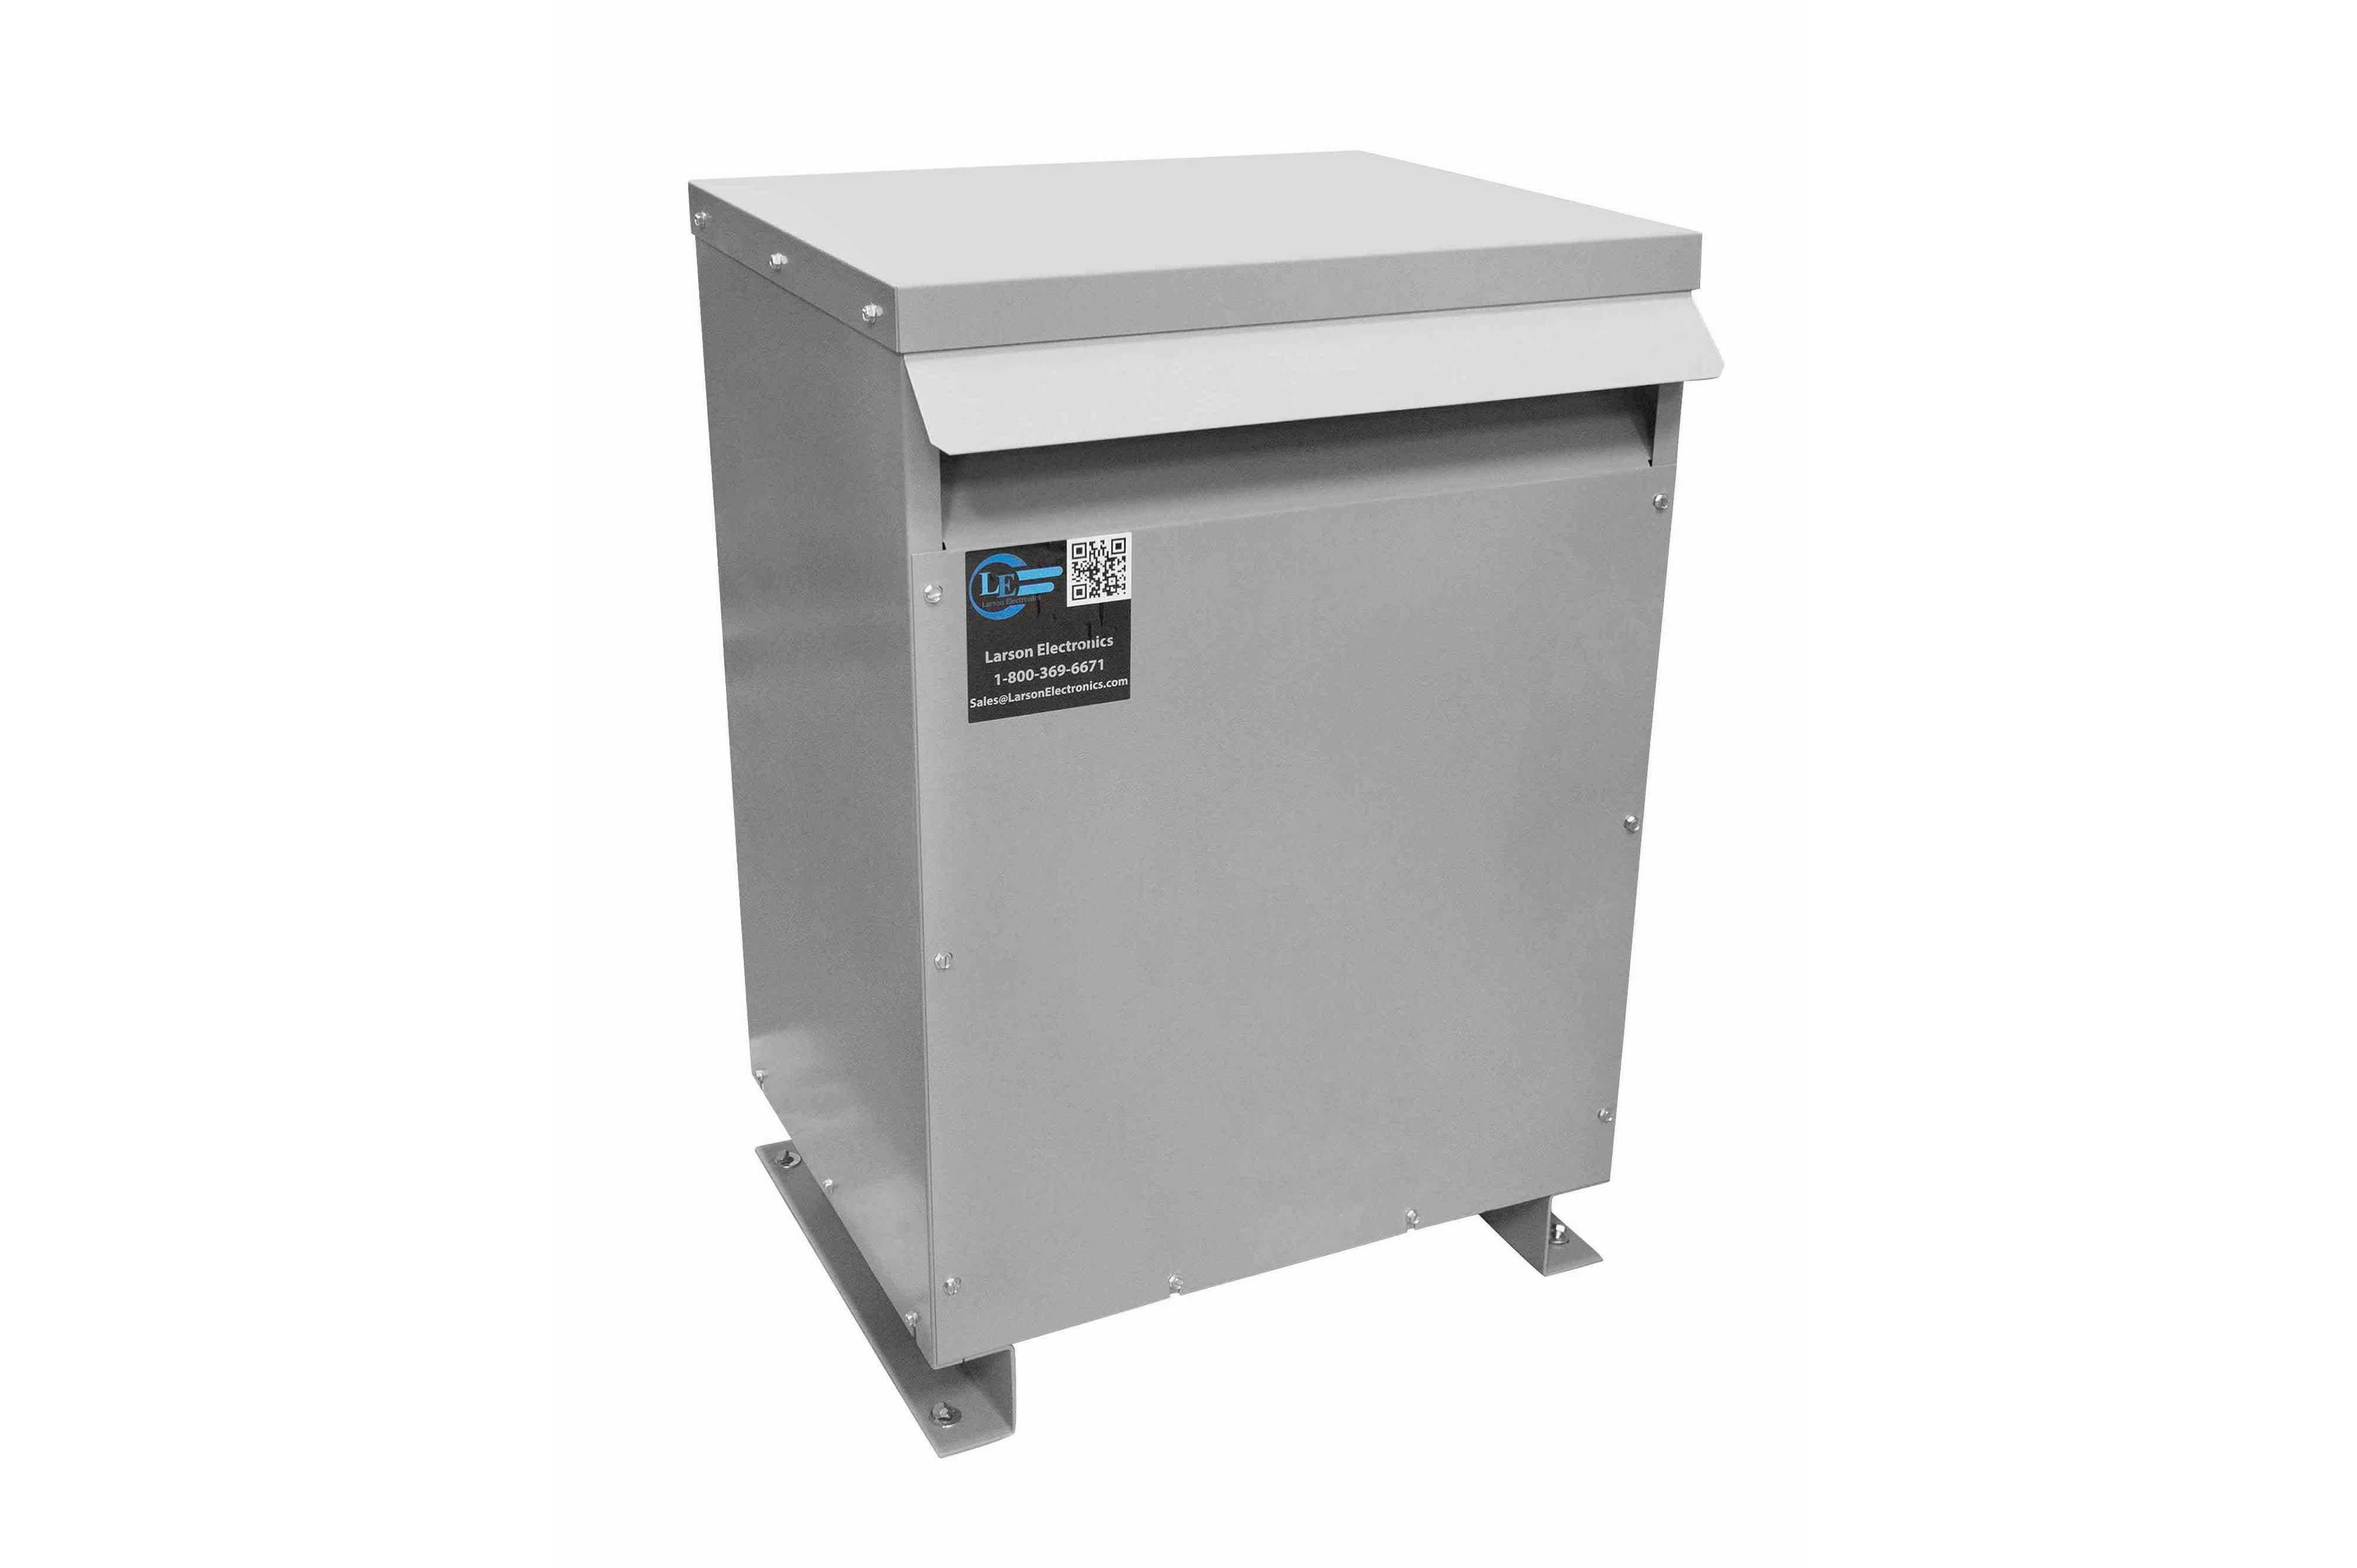 27 kVA 3PH Isolation Transformer, 600V Wye Primary, 400V Delta Secondary, N3R, Ventilated, 60 Hz